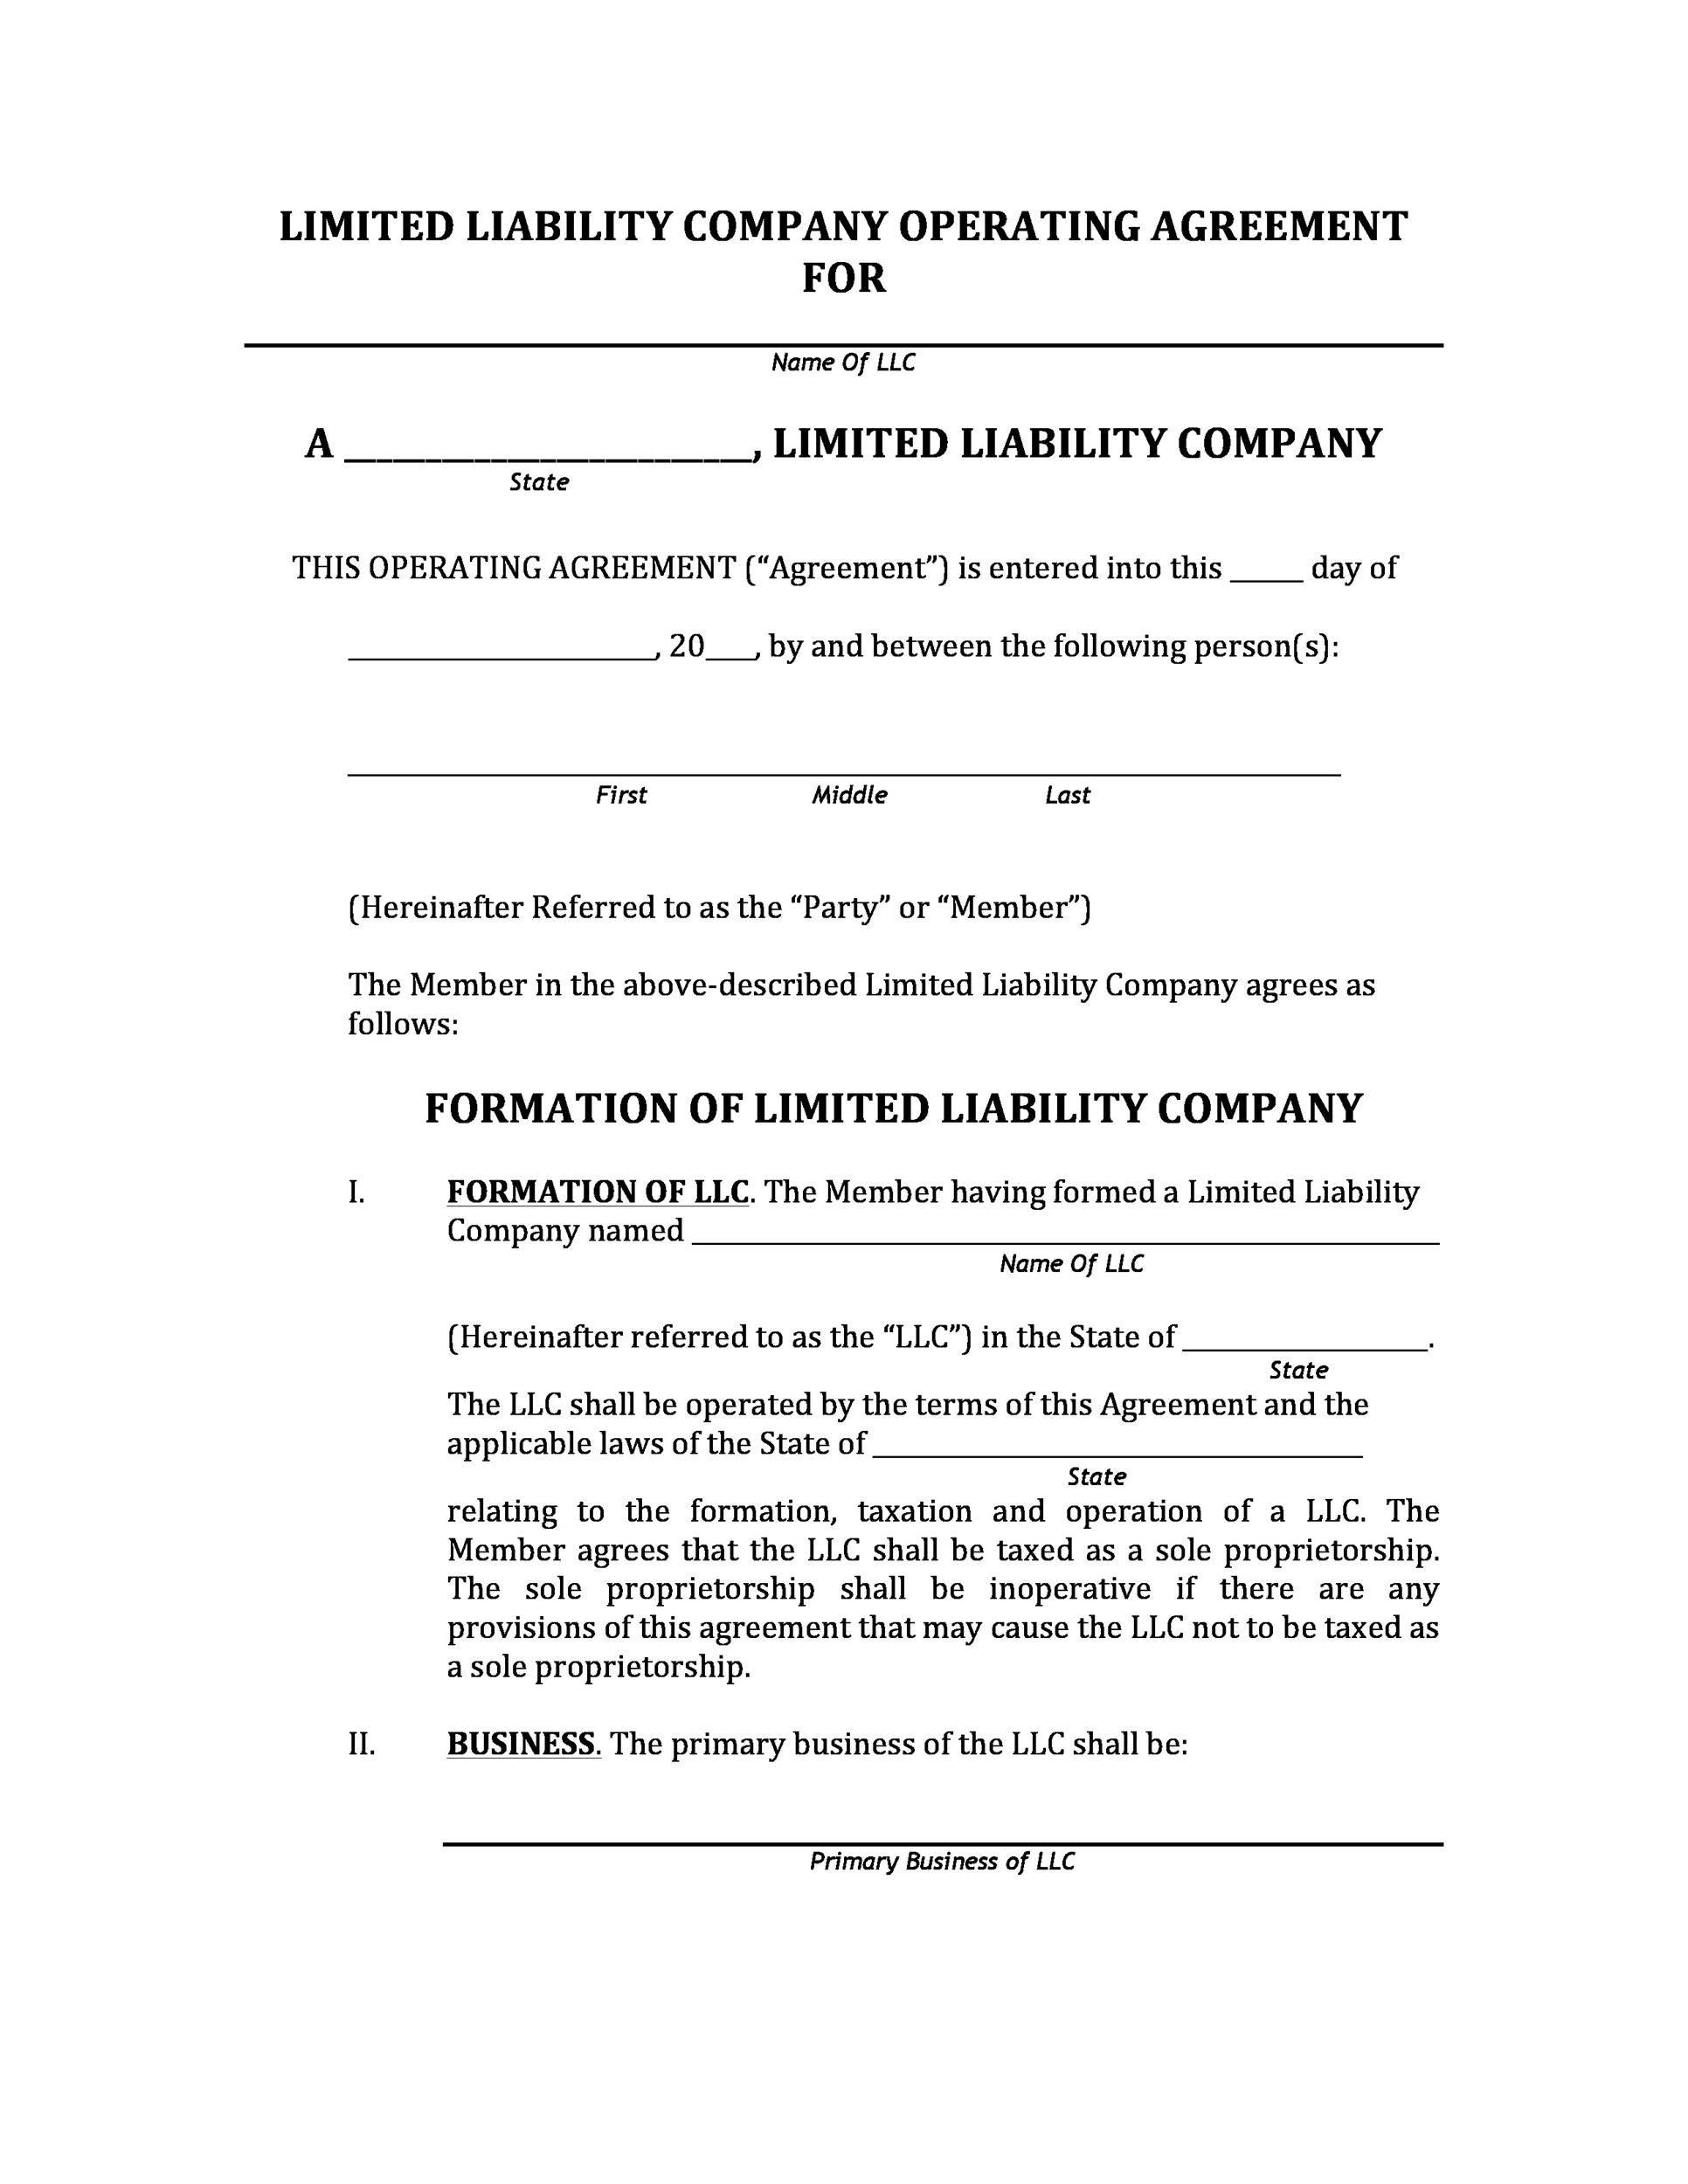 005 Top Operation Agreement Llc Template High Resolution  Operating Florida Indiana Single Member CaliforniaFull